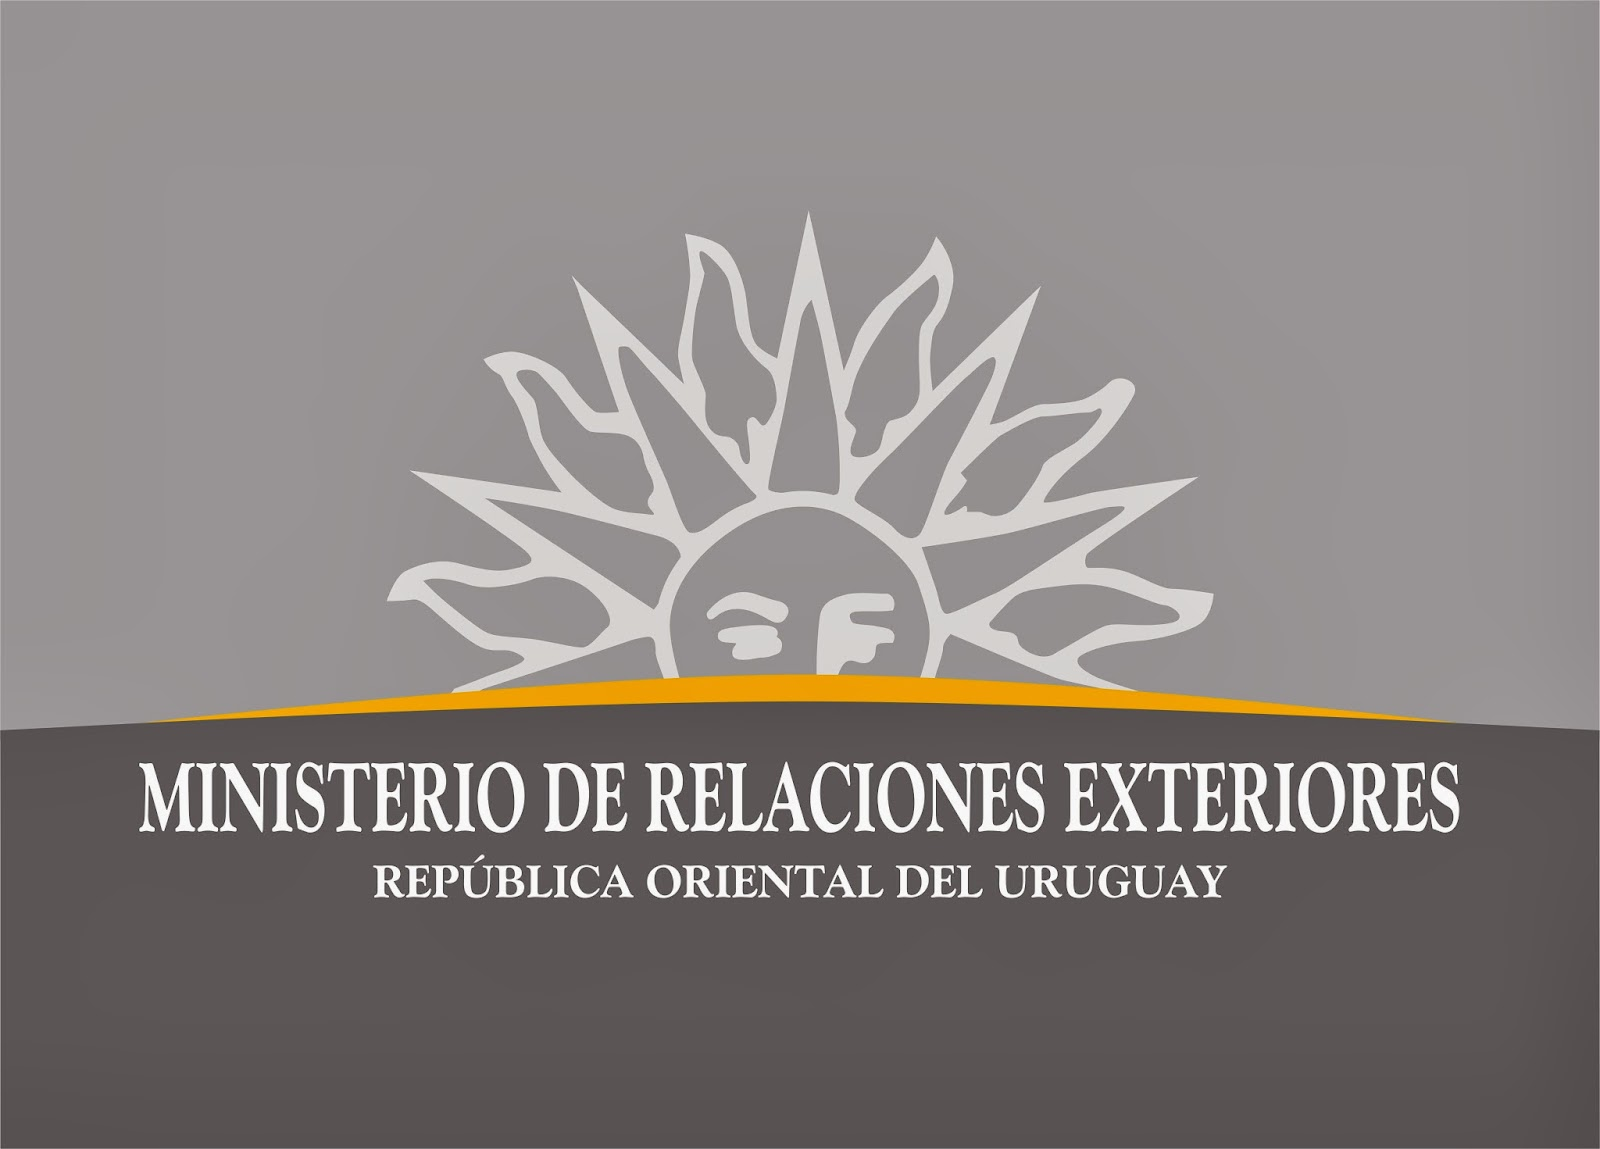 Diego masi pinturas for Ministerio relaciones exteriores ecuador